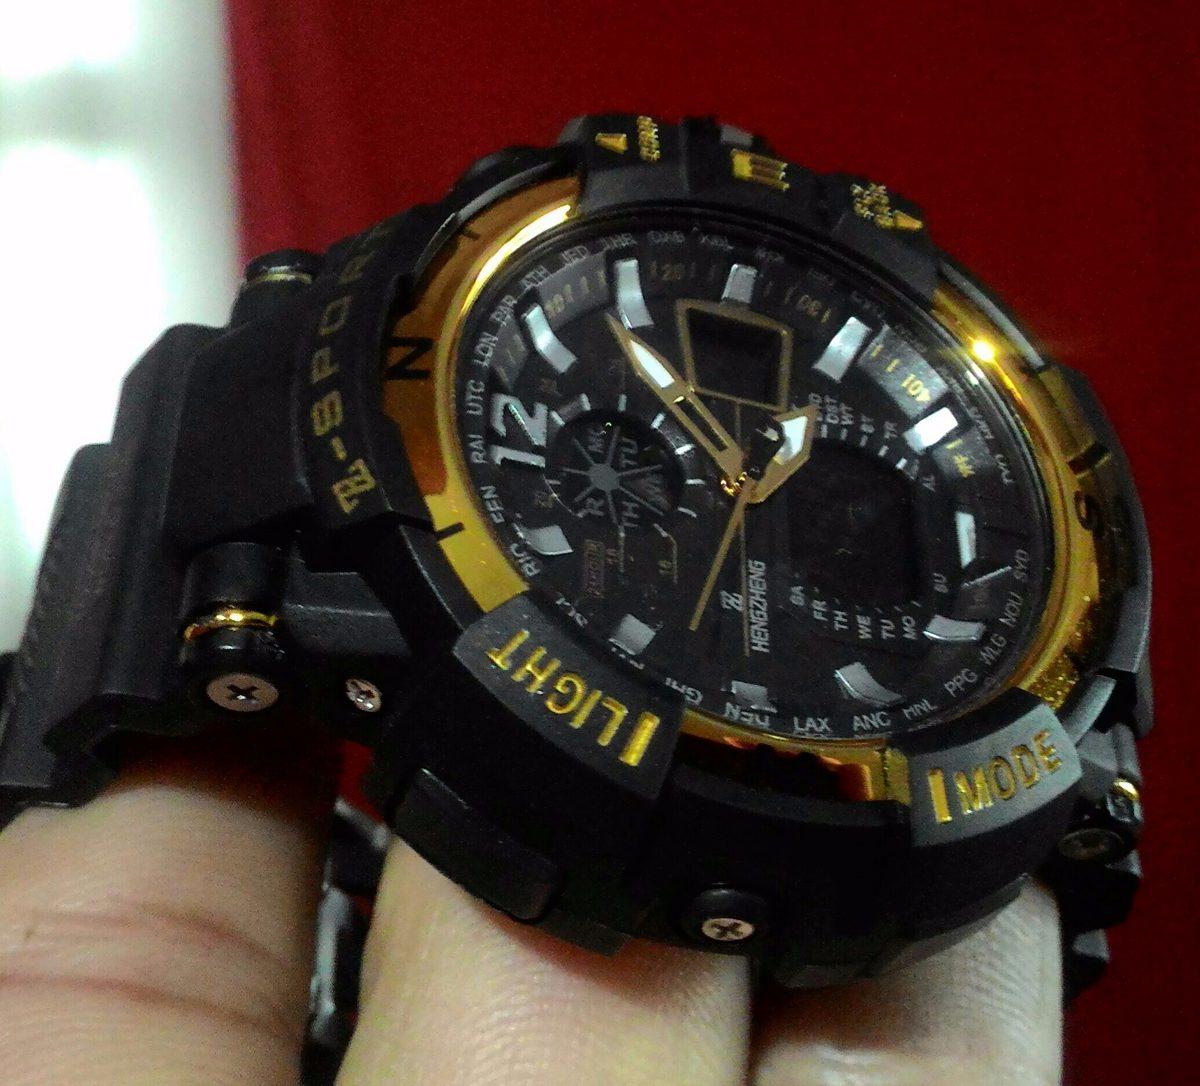 8283f123609 relógio shock masculino pulso digital analogico z sport 490. Carregando  zoom... relógio masculino pulso. Carregando zoom.